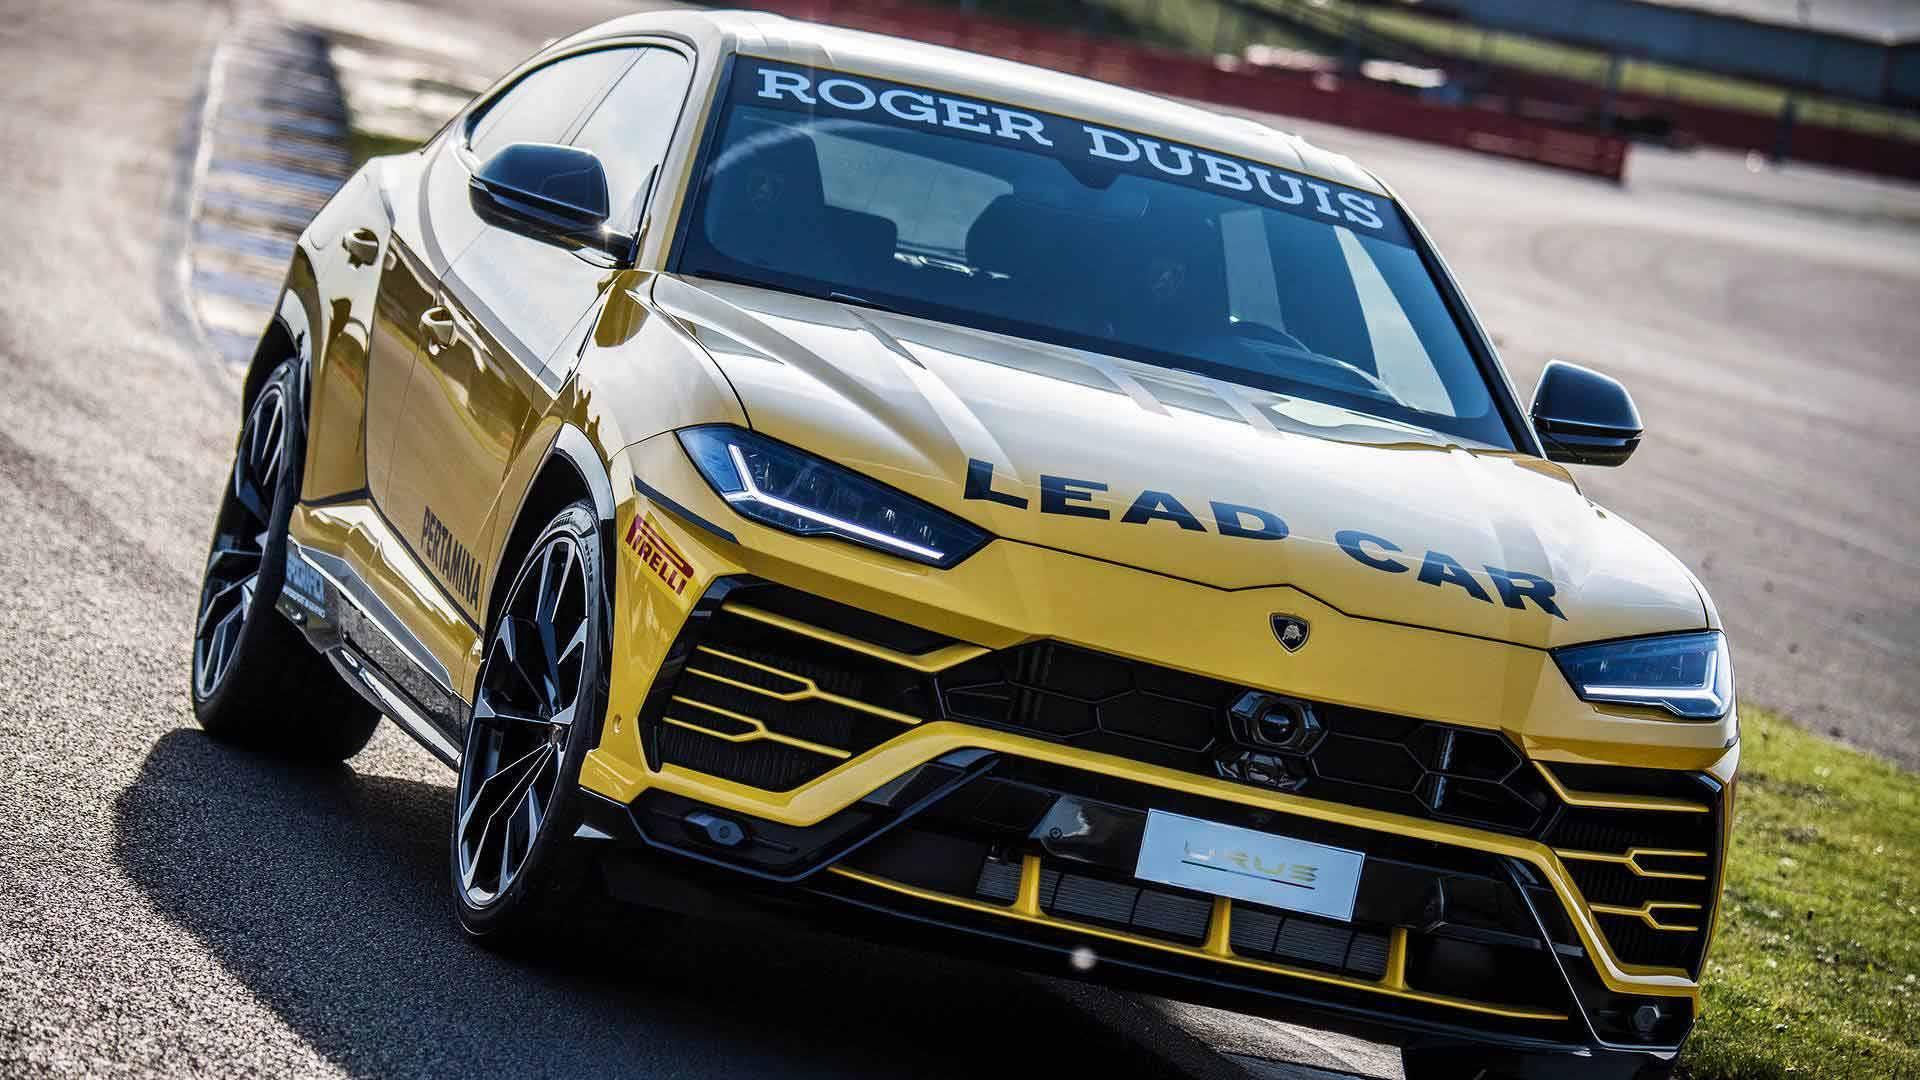 Lamborghini представила гоночный кроссовер Urus Super Trofeo Europe